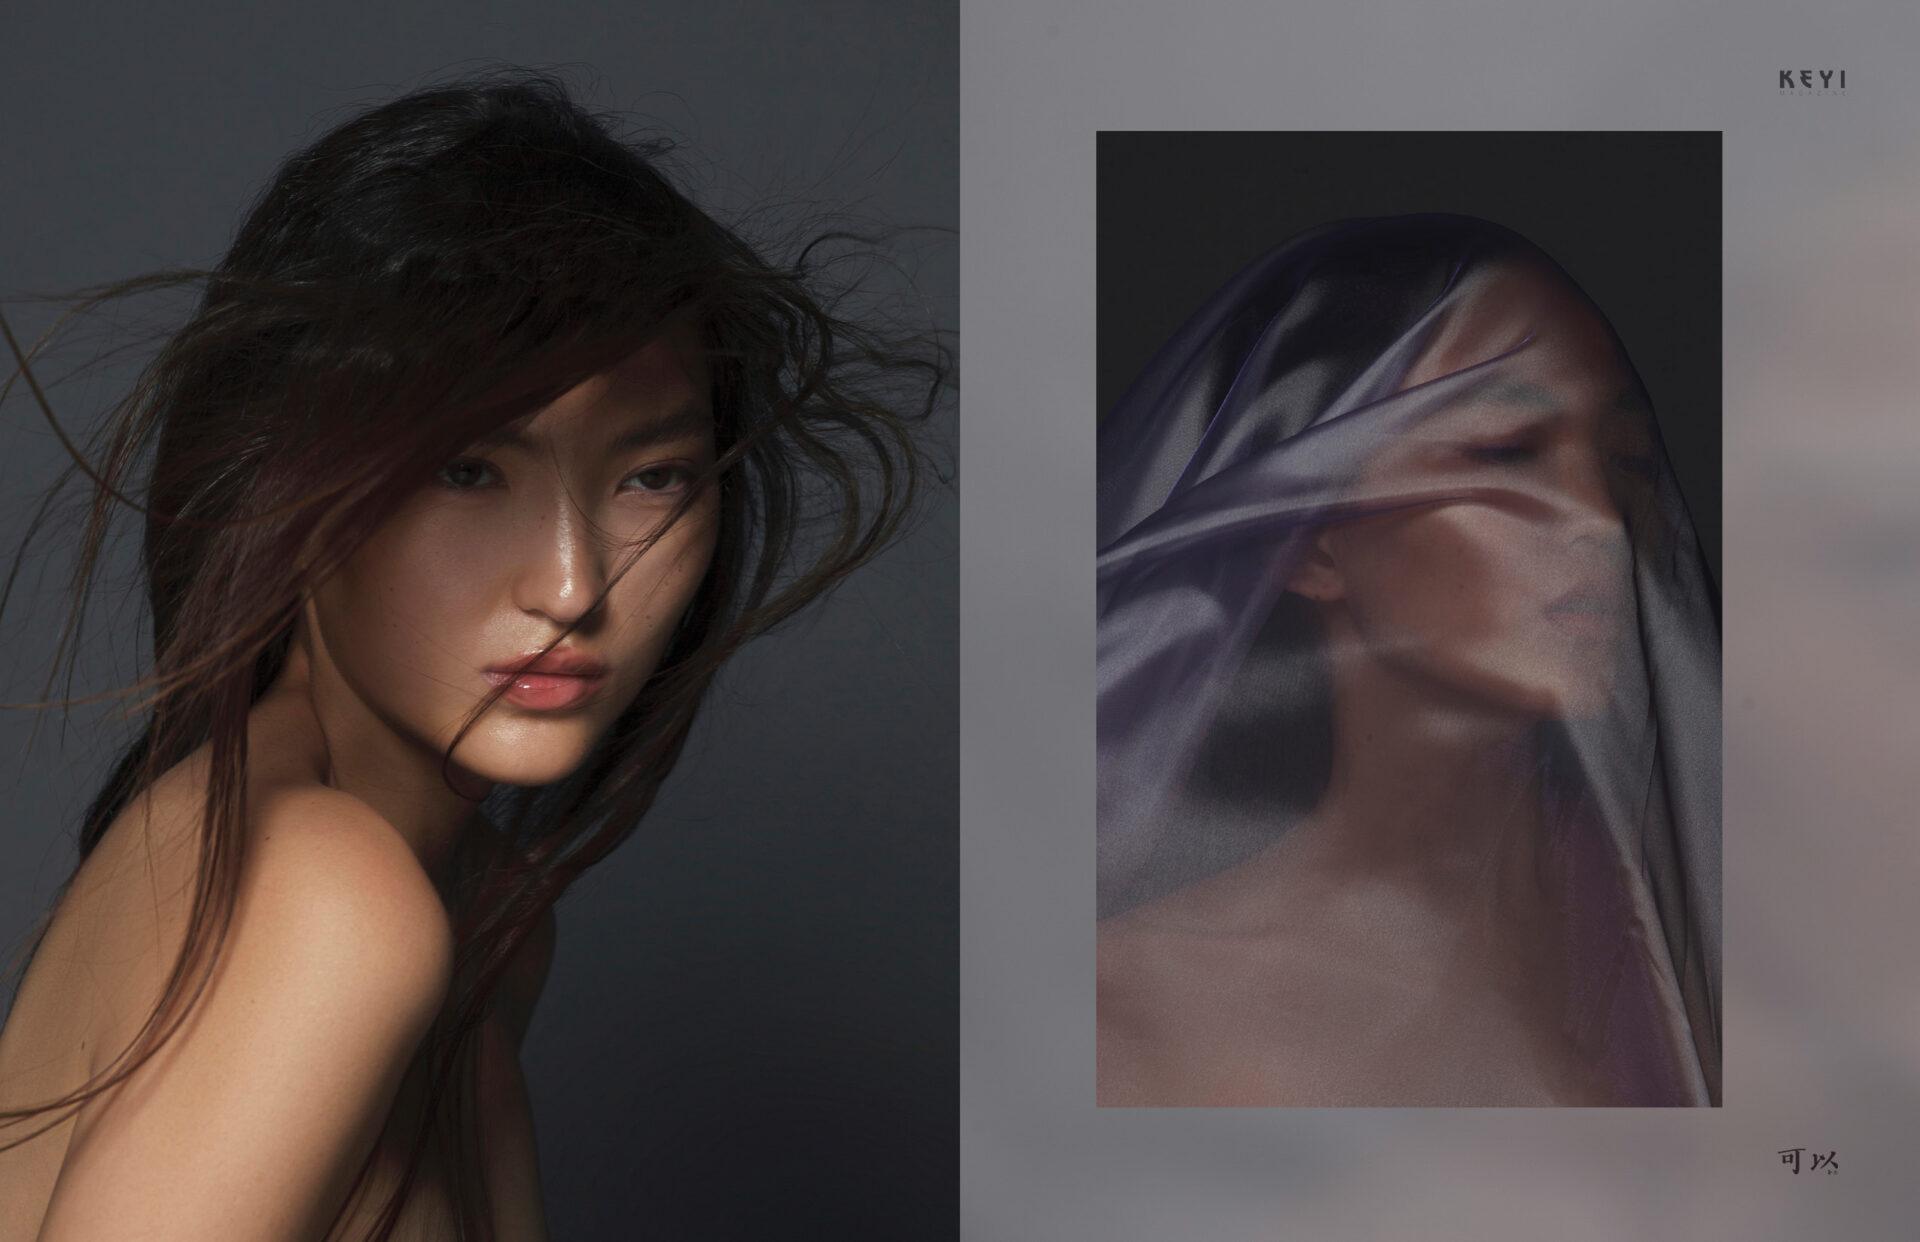 """Venera"" by Venera Abibullaeva  with Borte from Ultra  Models Agency for KEYI Magazine Berlin"